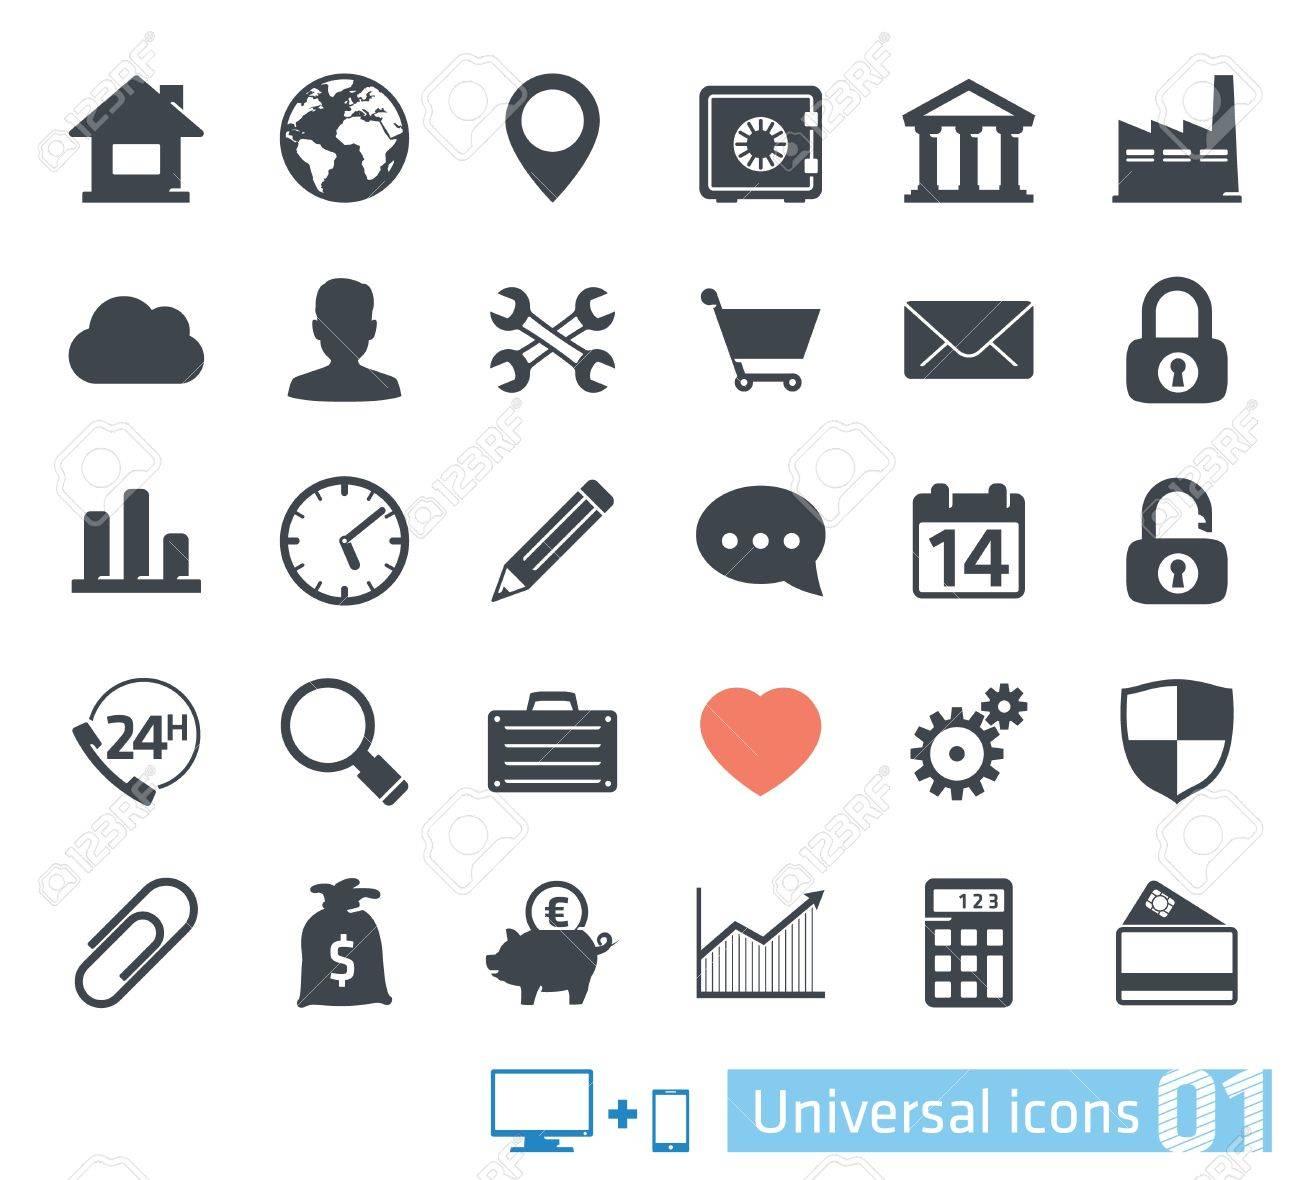 Universal icons set 01 - 20872531